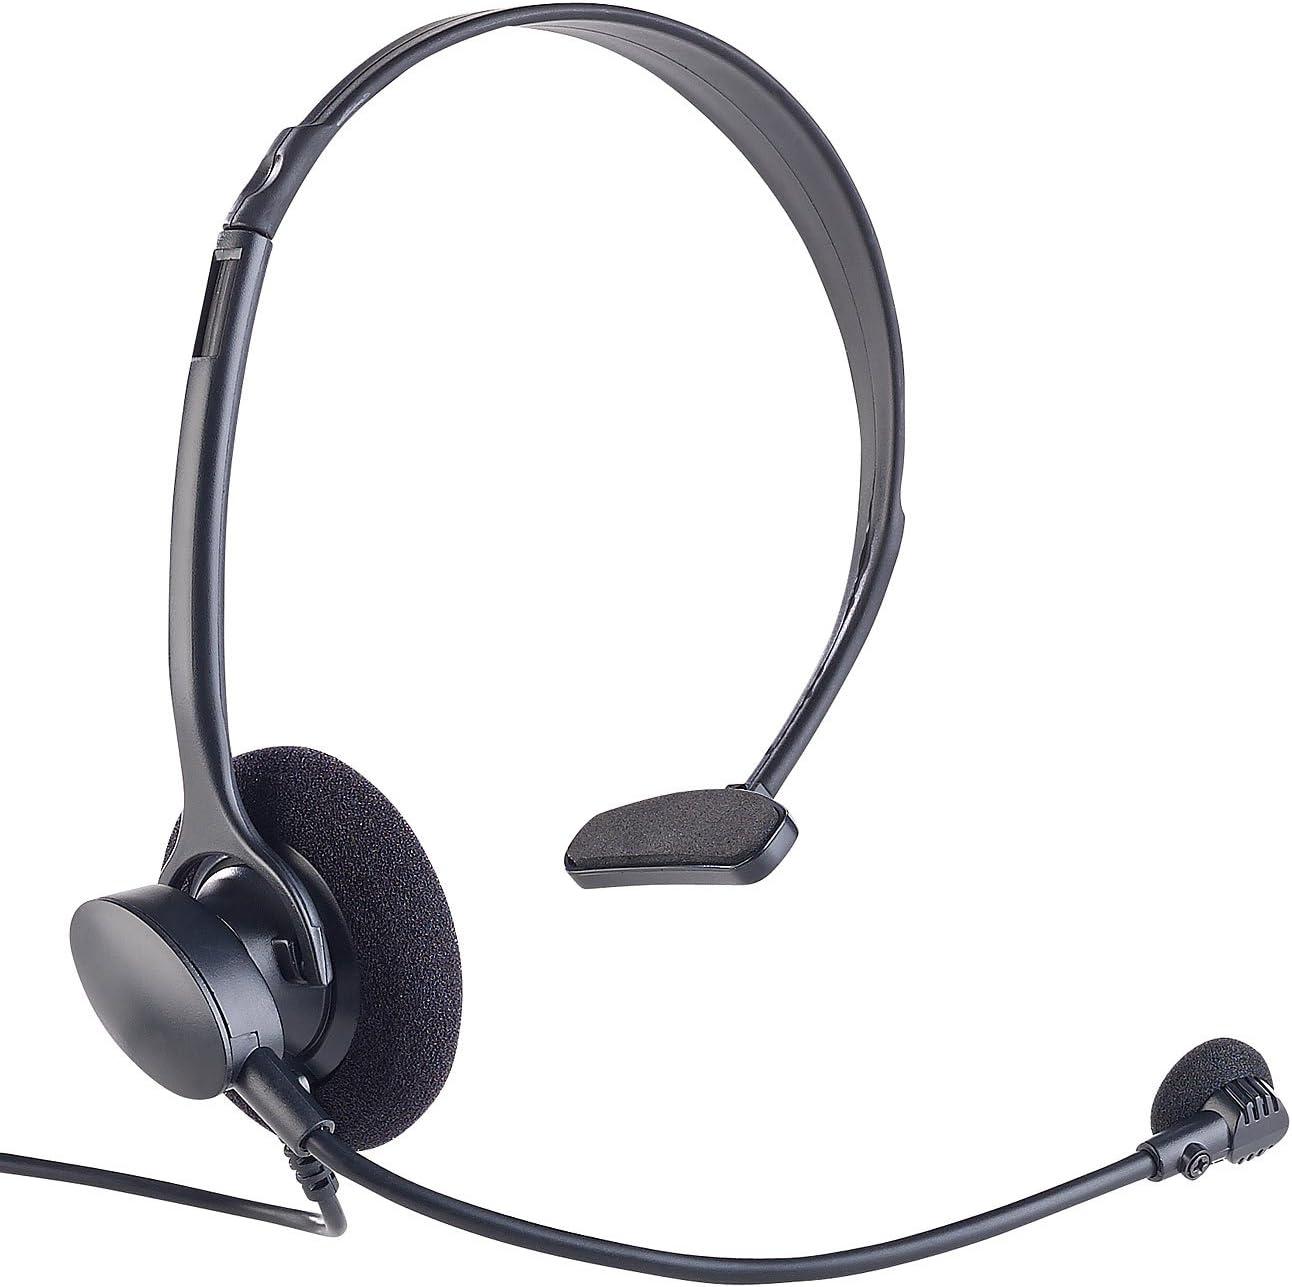 Callstel Profi-Telefon-Headset inklusive Connector-Box für Festnetz-Telefone